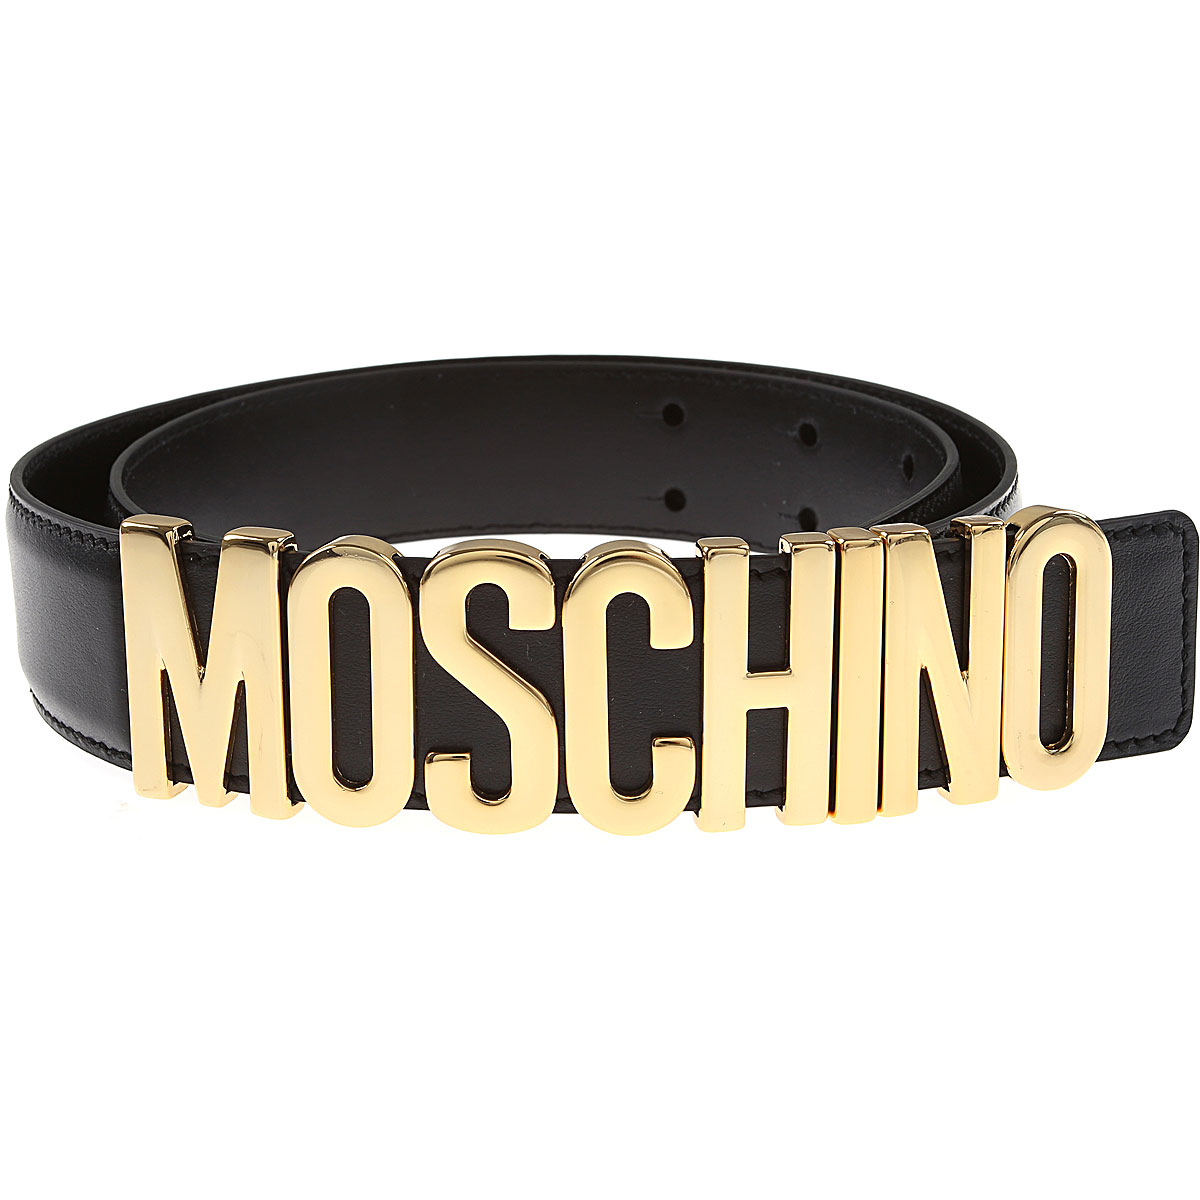 Moschino Gürtel, Schwarz, Echtes Leder |